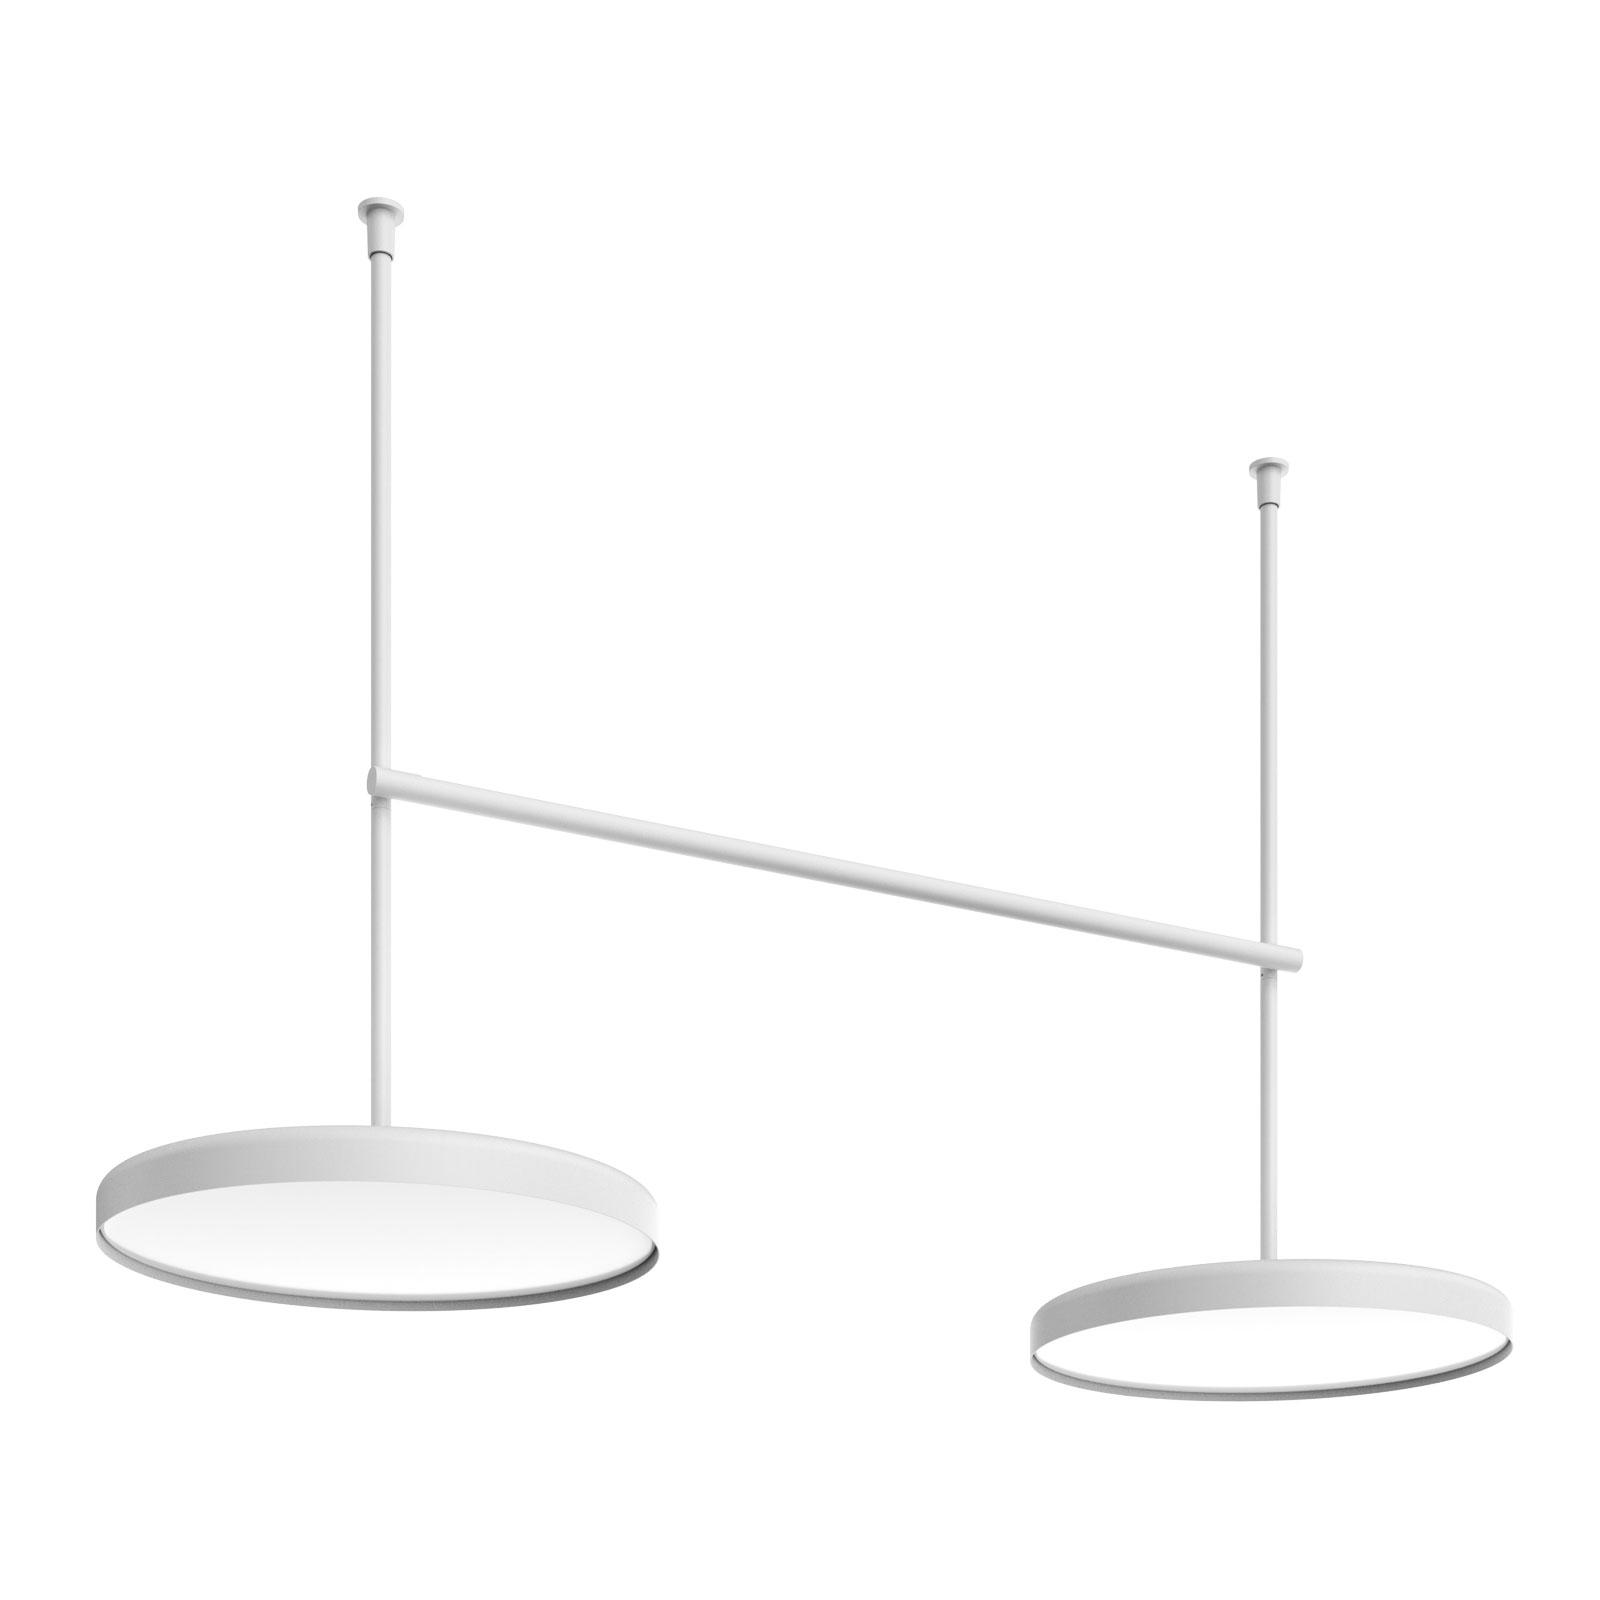 FLOS Infra-Structure C4 LED plafondlamp wit